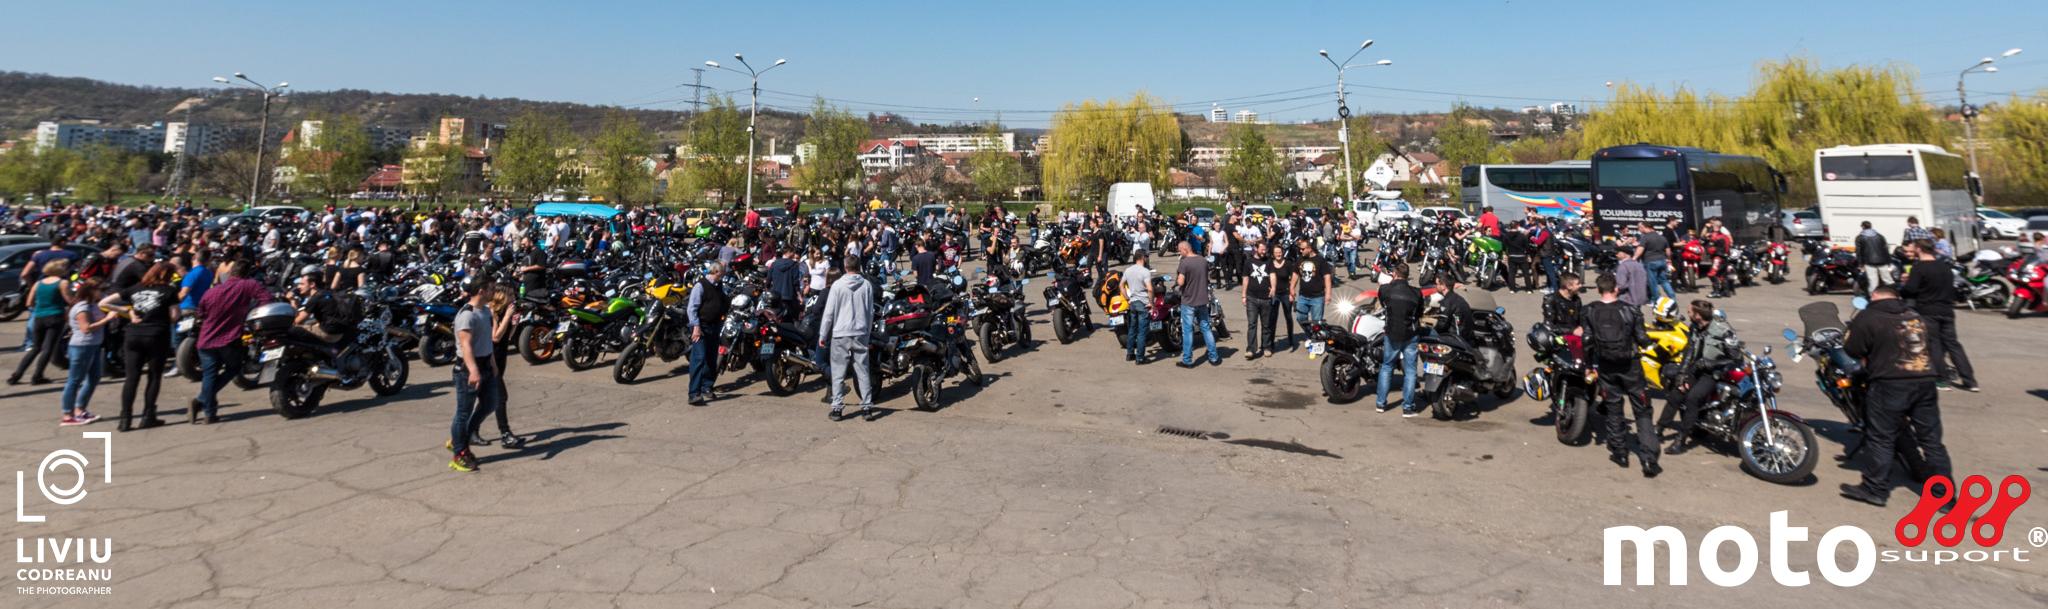 001.Campania Atentie la motociclisti - 2017 - motosuport.ro